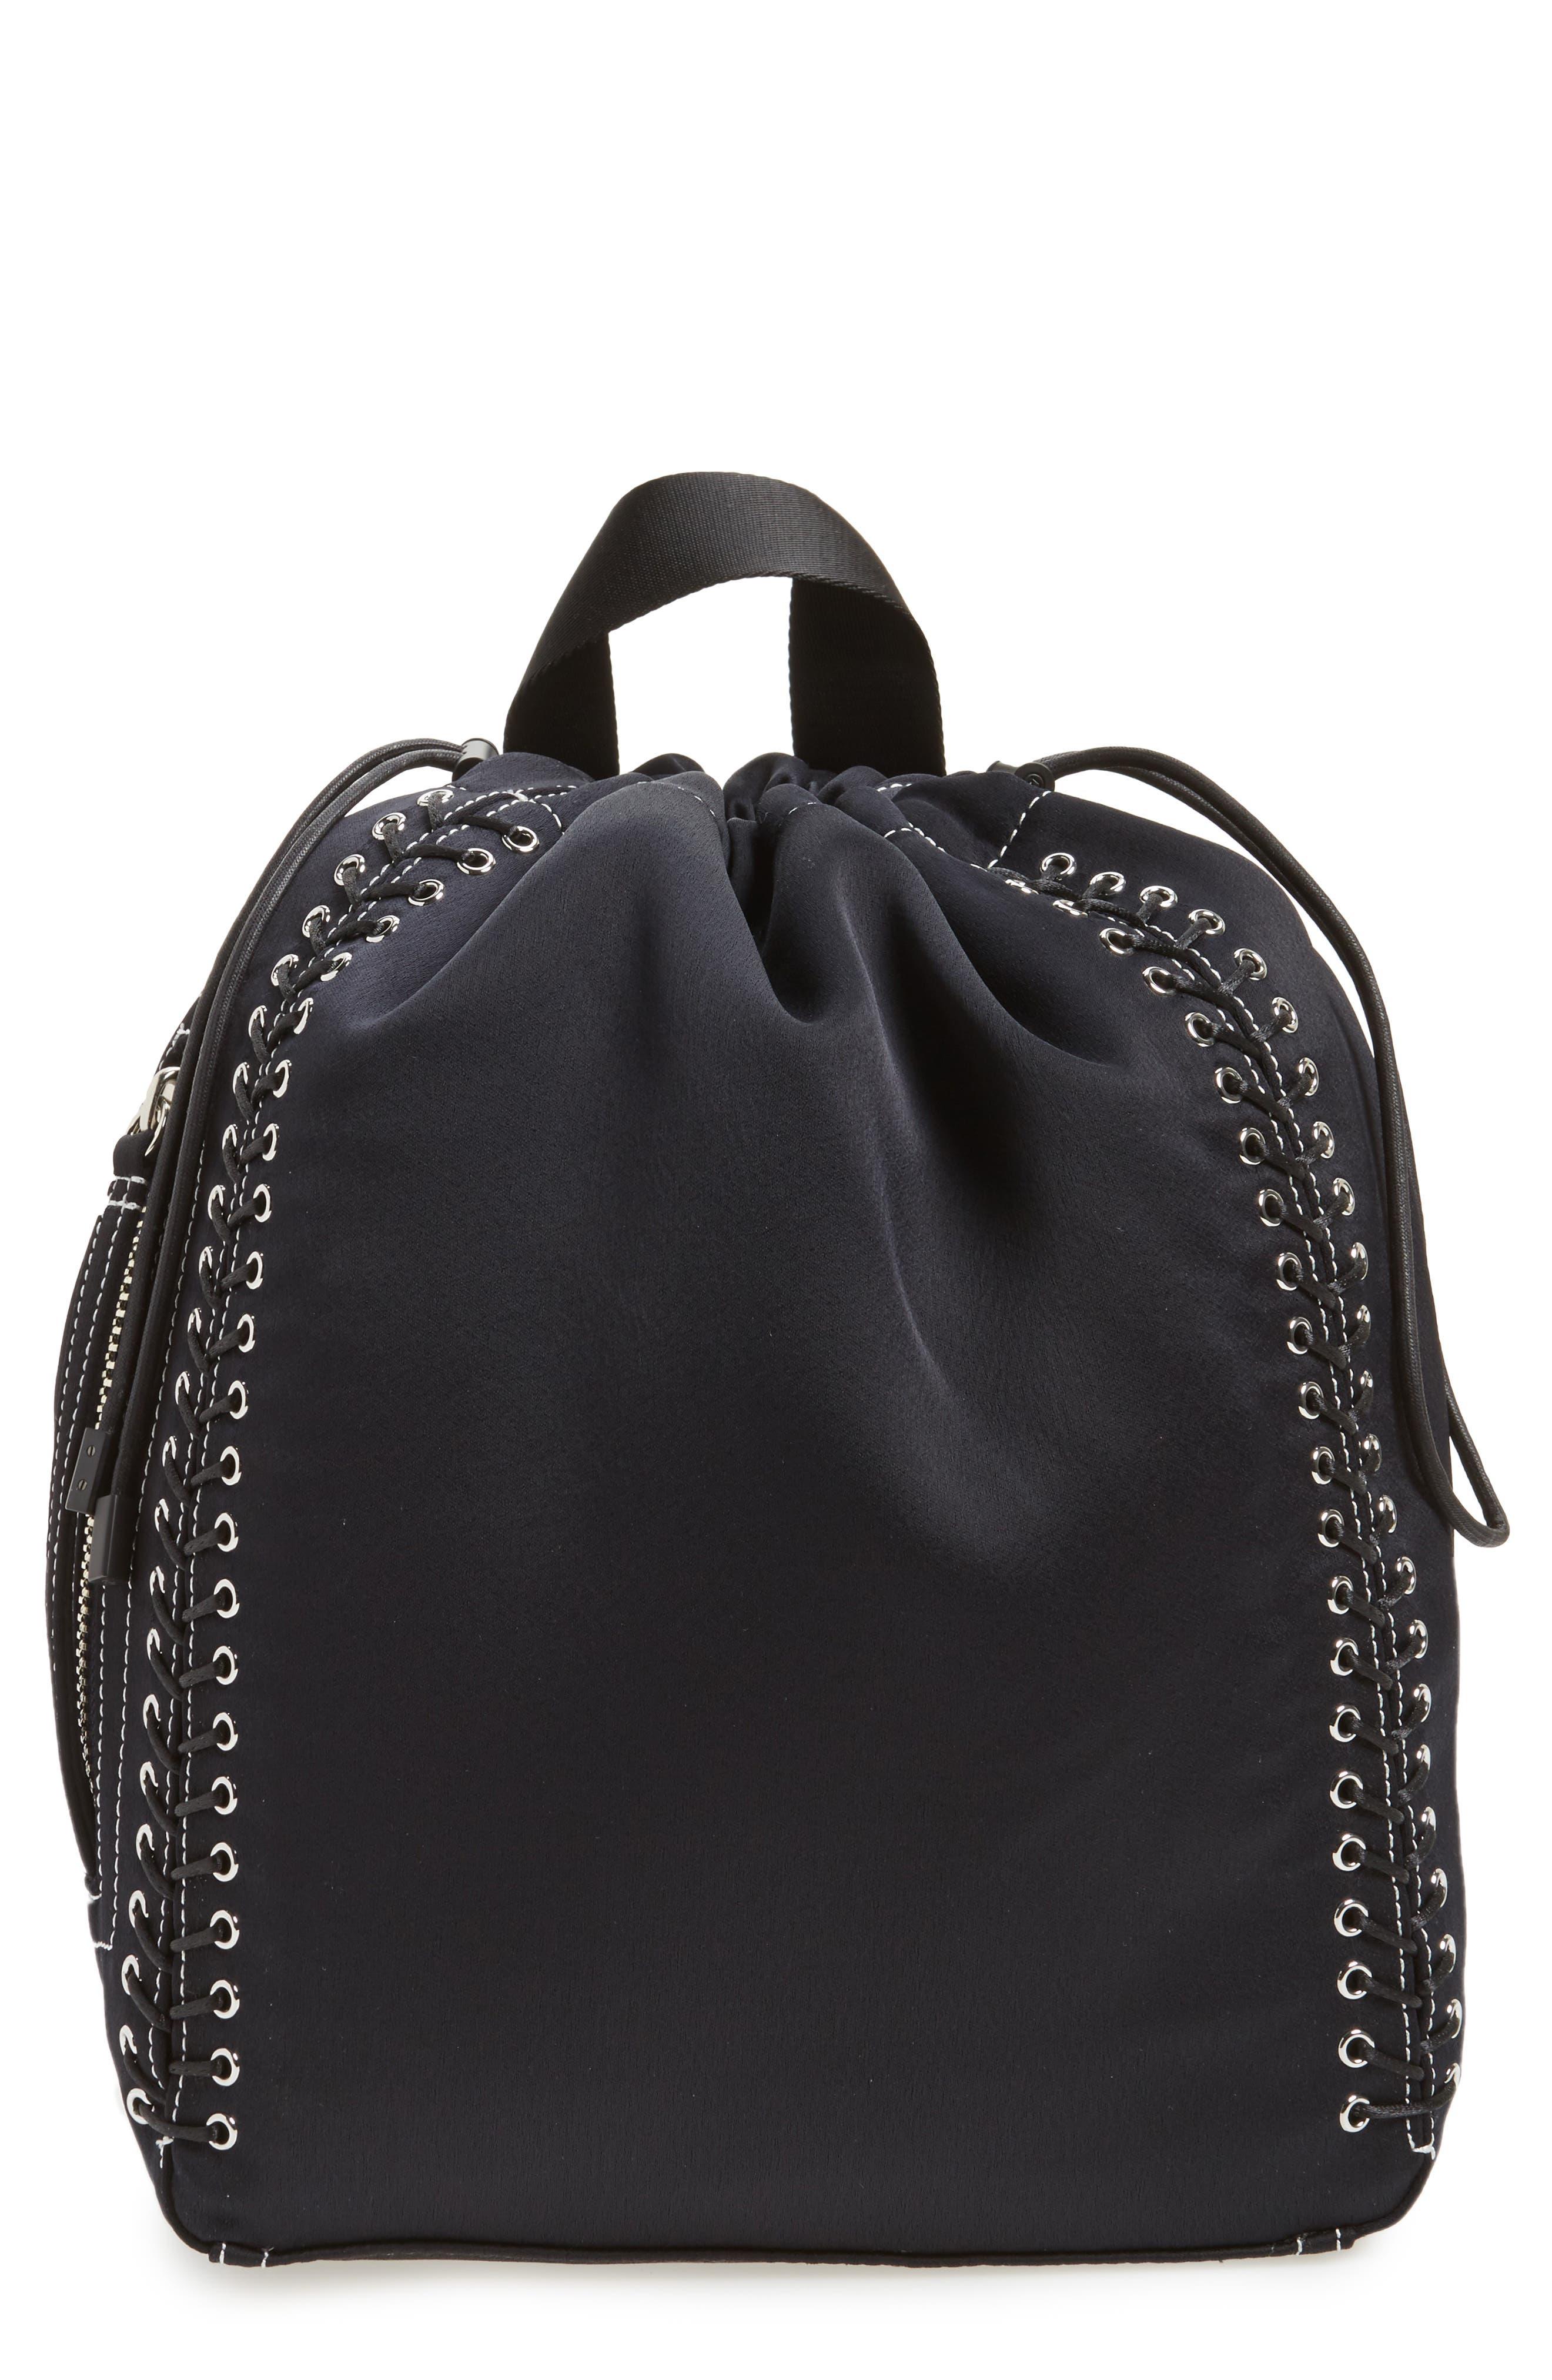 Phillip Lim 3.1 Medium Go-Go Lace-Up Backpack,                             Main thumbnail 1, color,                             420